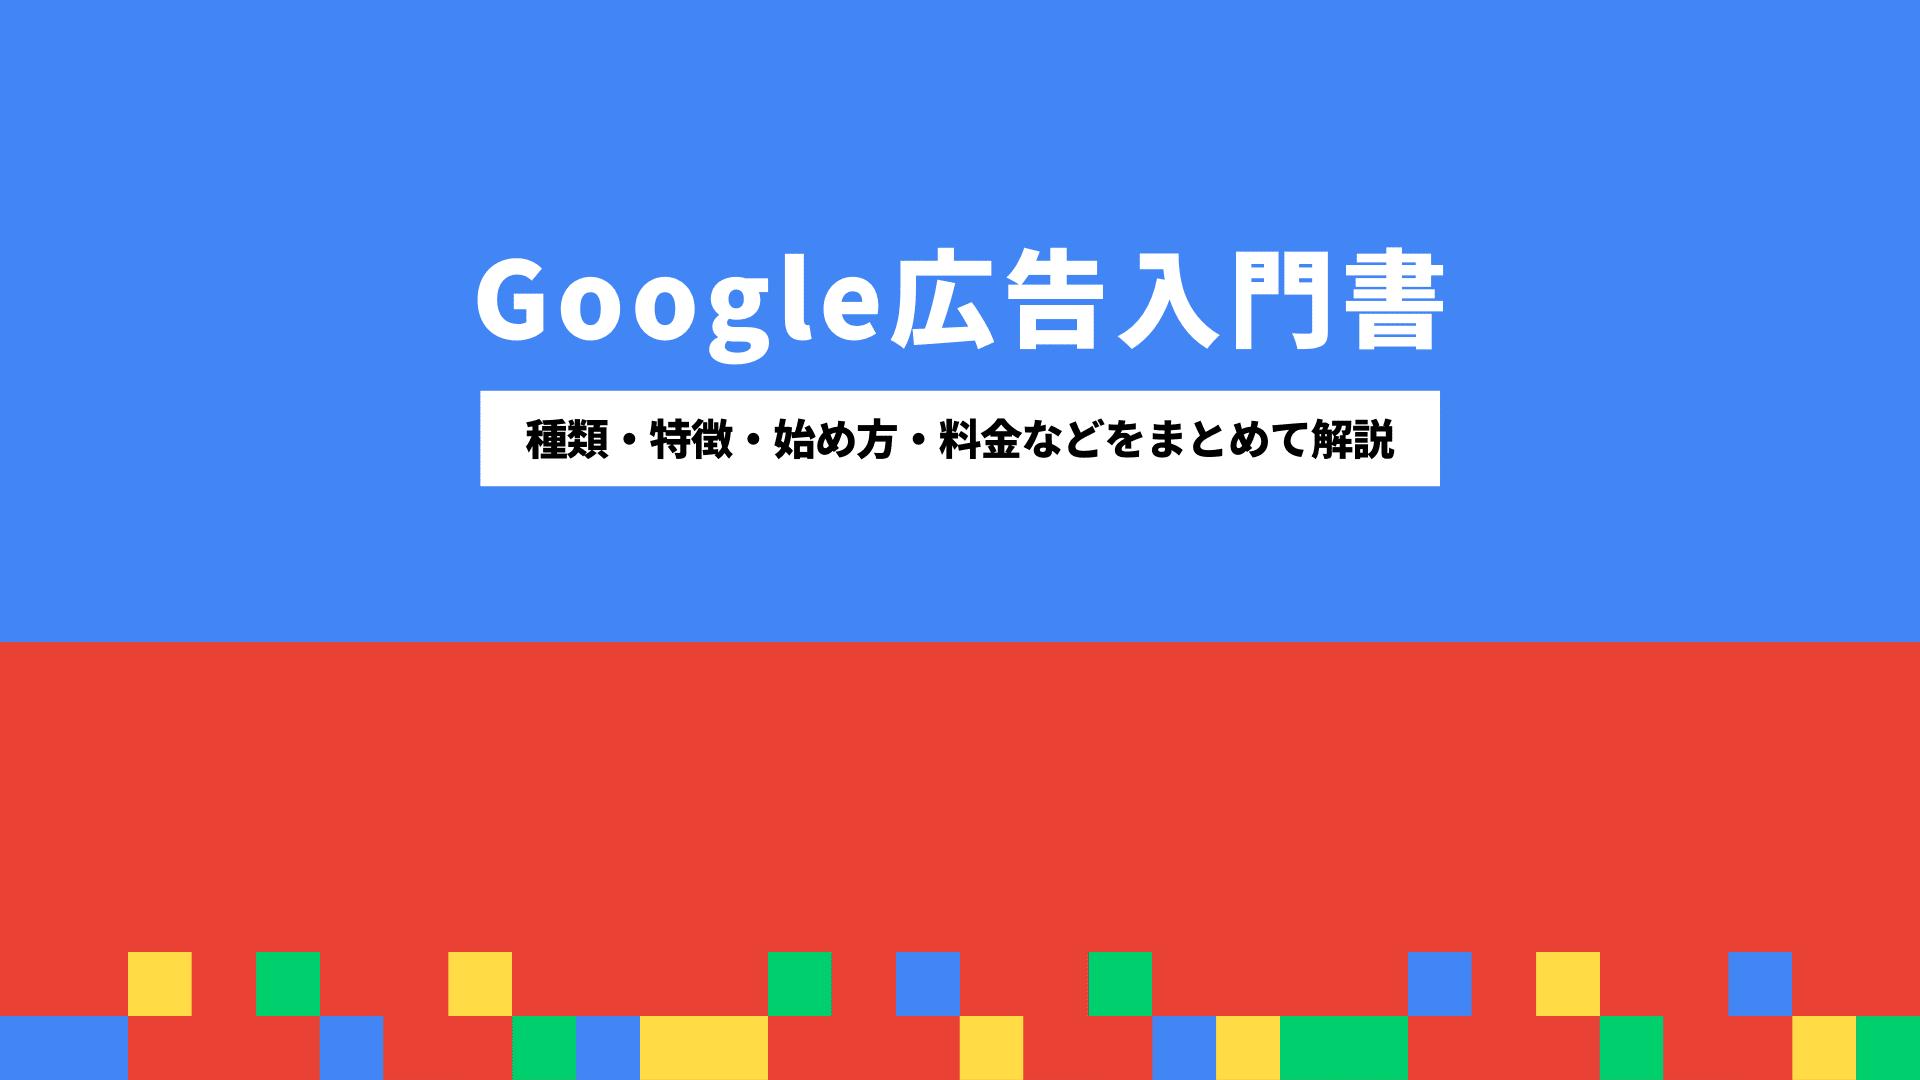 Google広告入門書|広告の種類・特徴・始め方・料金などをまとめて解説 | 株式会社Lunaim(ルネイム)